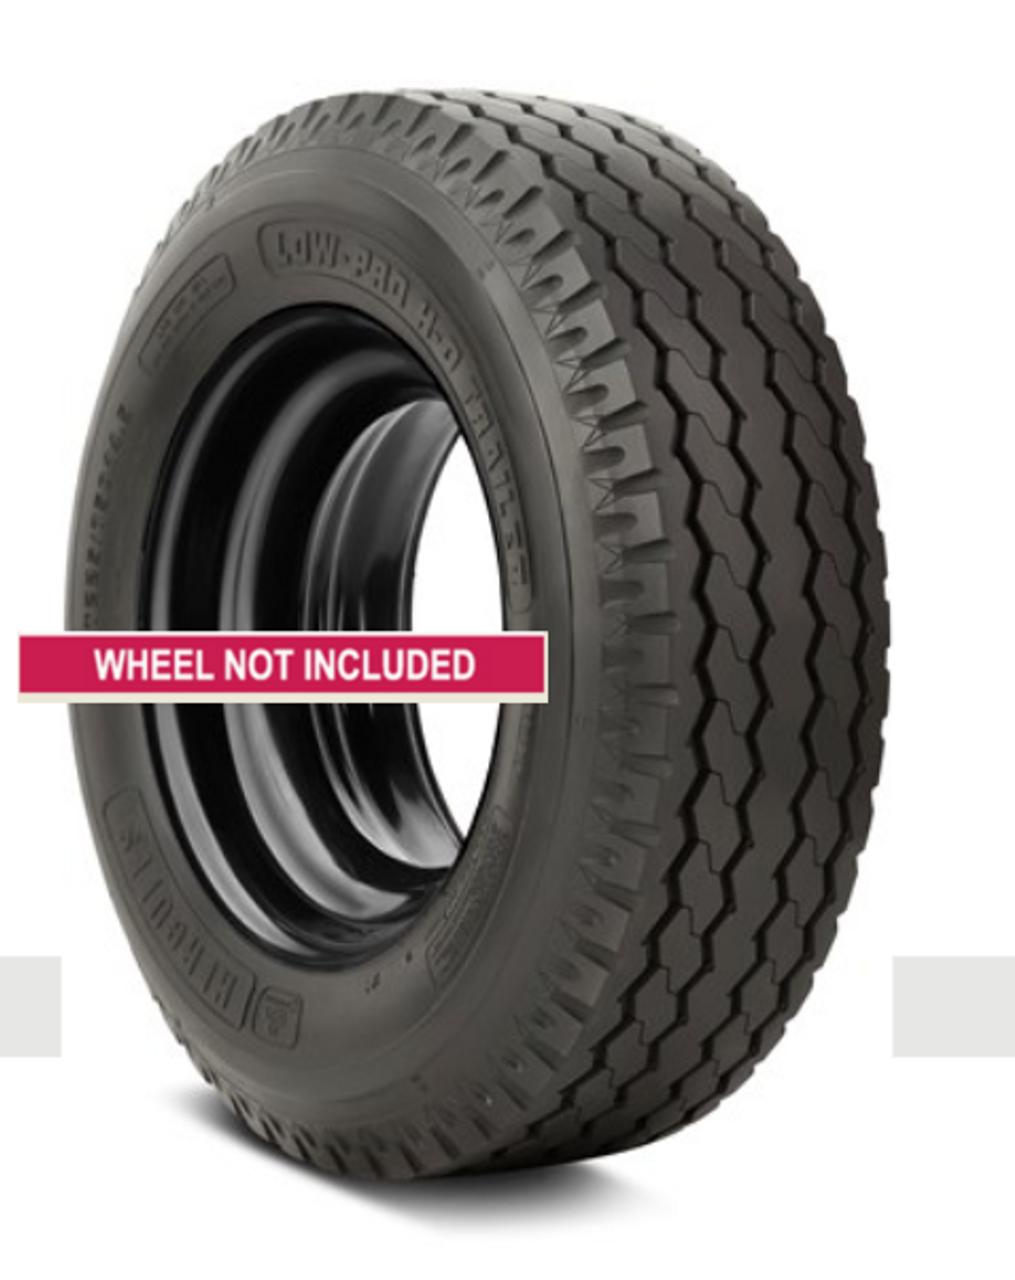 New Tire 225 75 14.5 Hercules Low Boy Trailer 14 ply 9-14.5 ST225/75D14.5